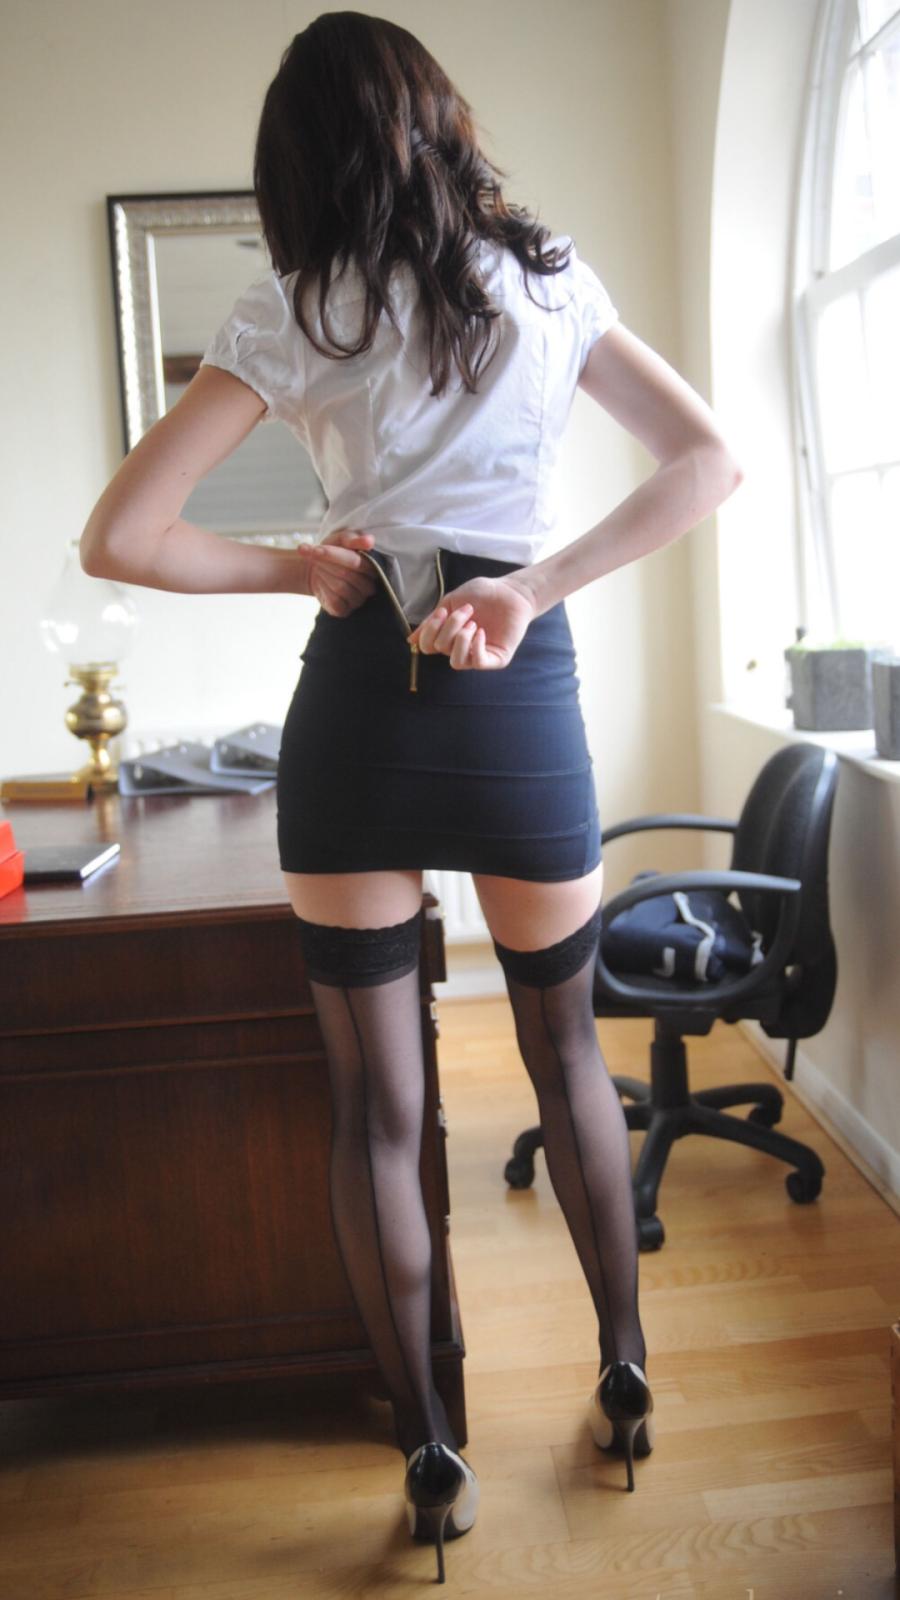 Sexy girls tumblr